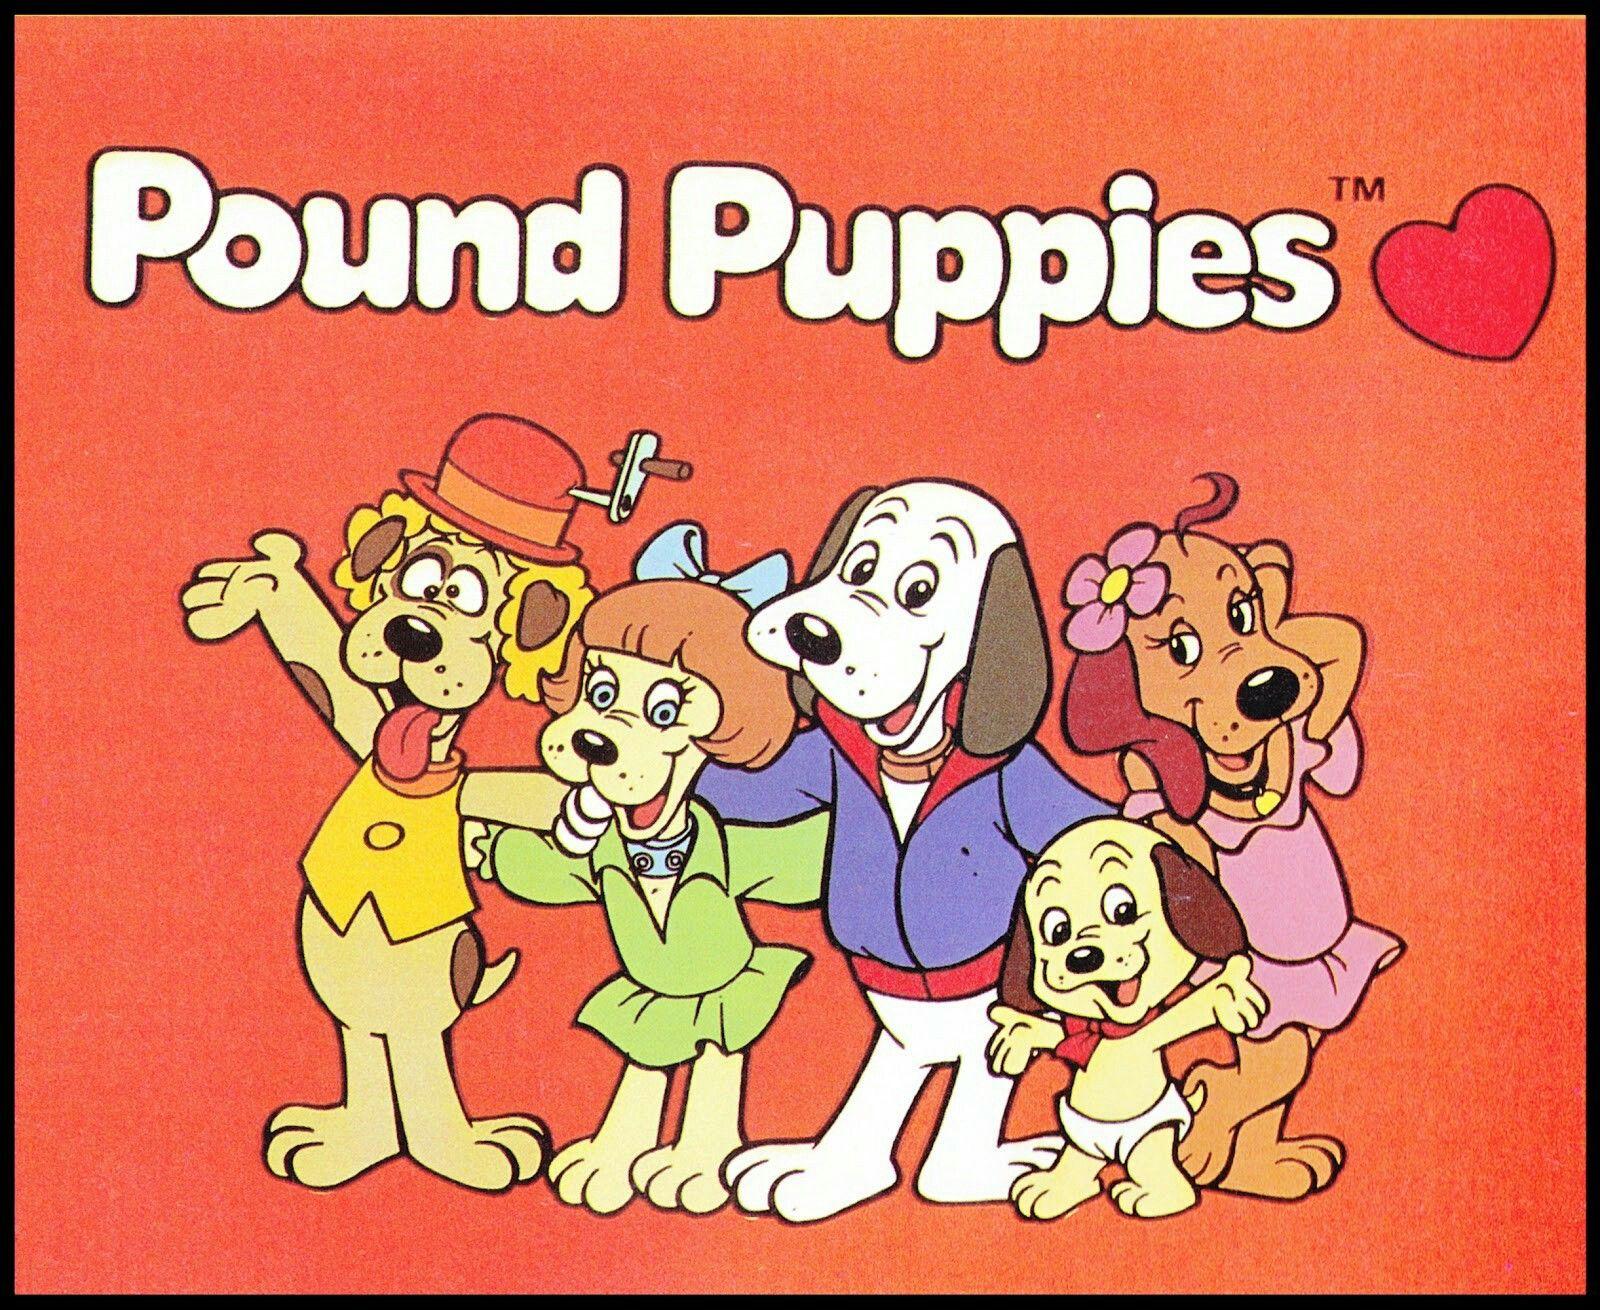 Pound puppies 80 s cartoons Pinterest